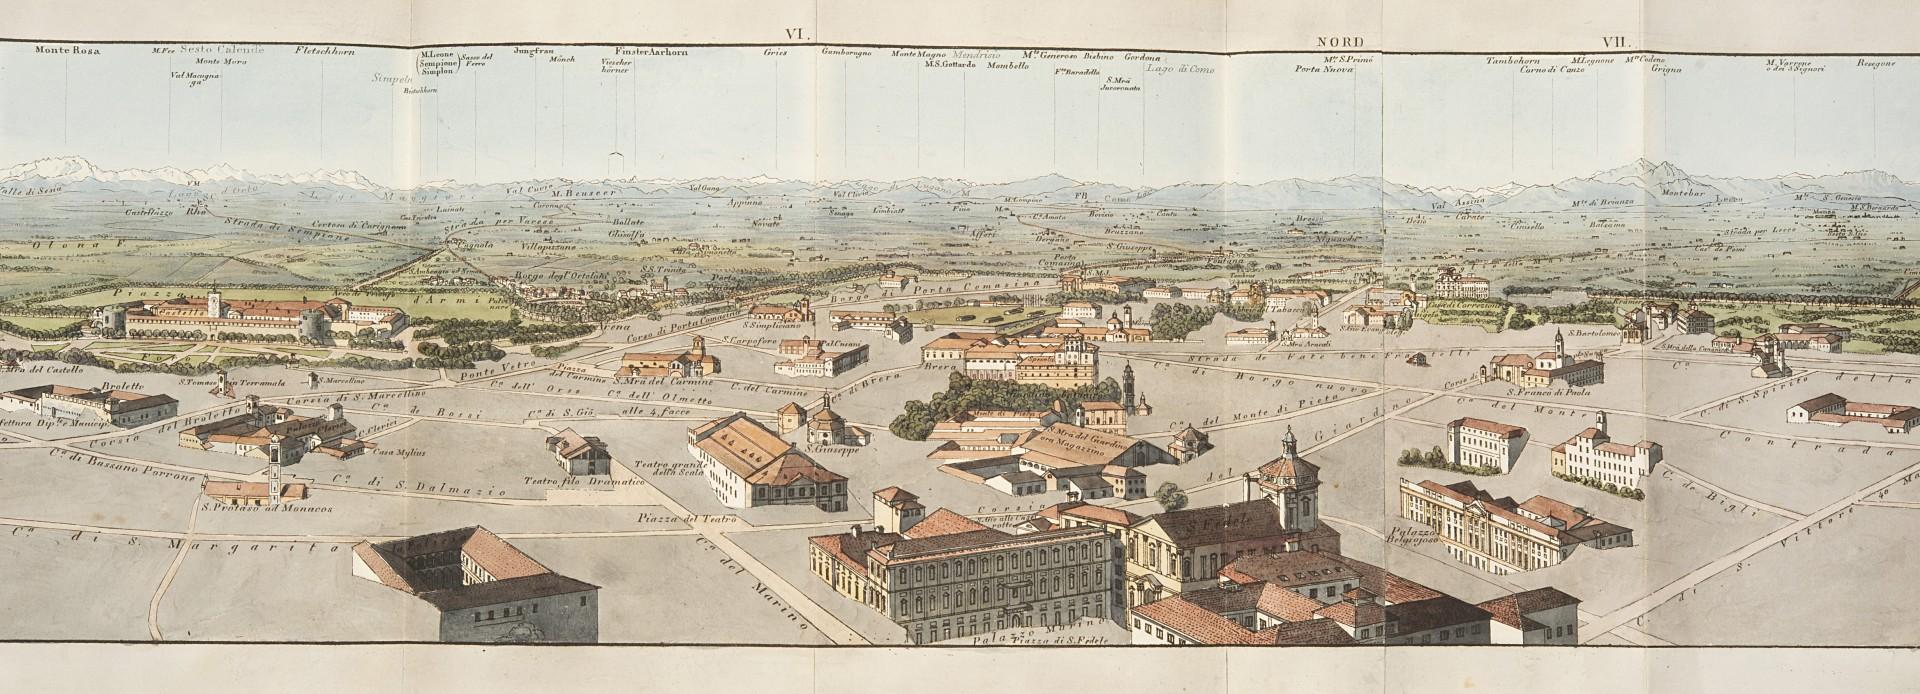 Keller, Heinrich Panorame de Milan. Panorama von Mailand. - Image 2 of 3